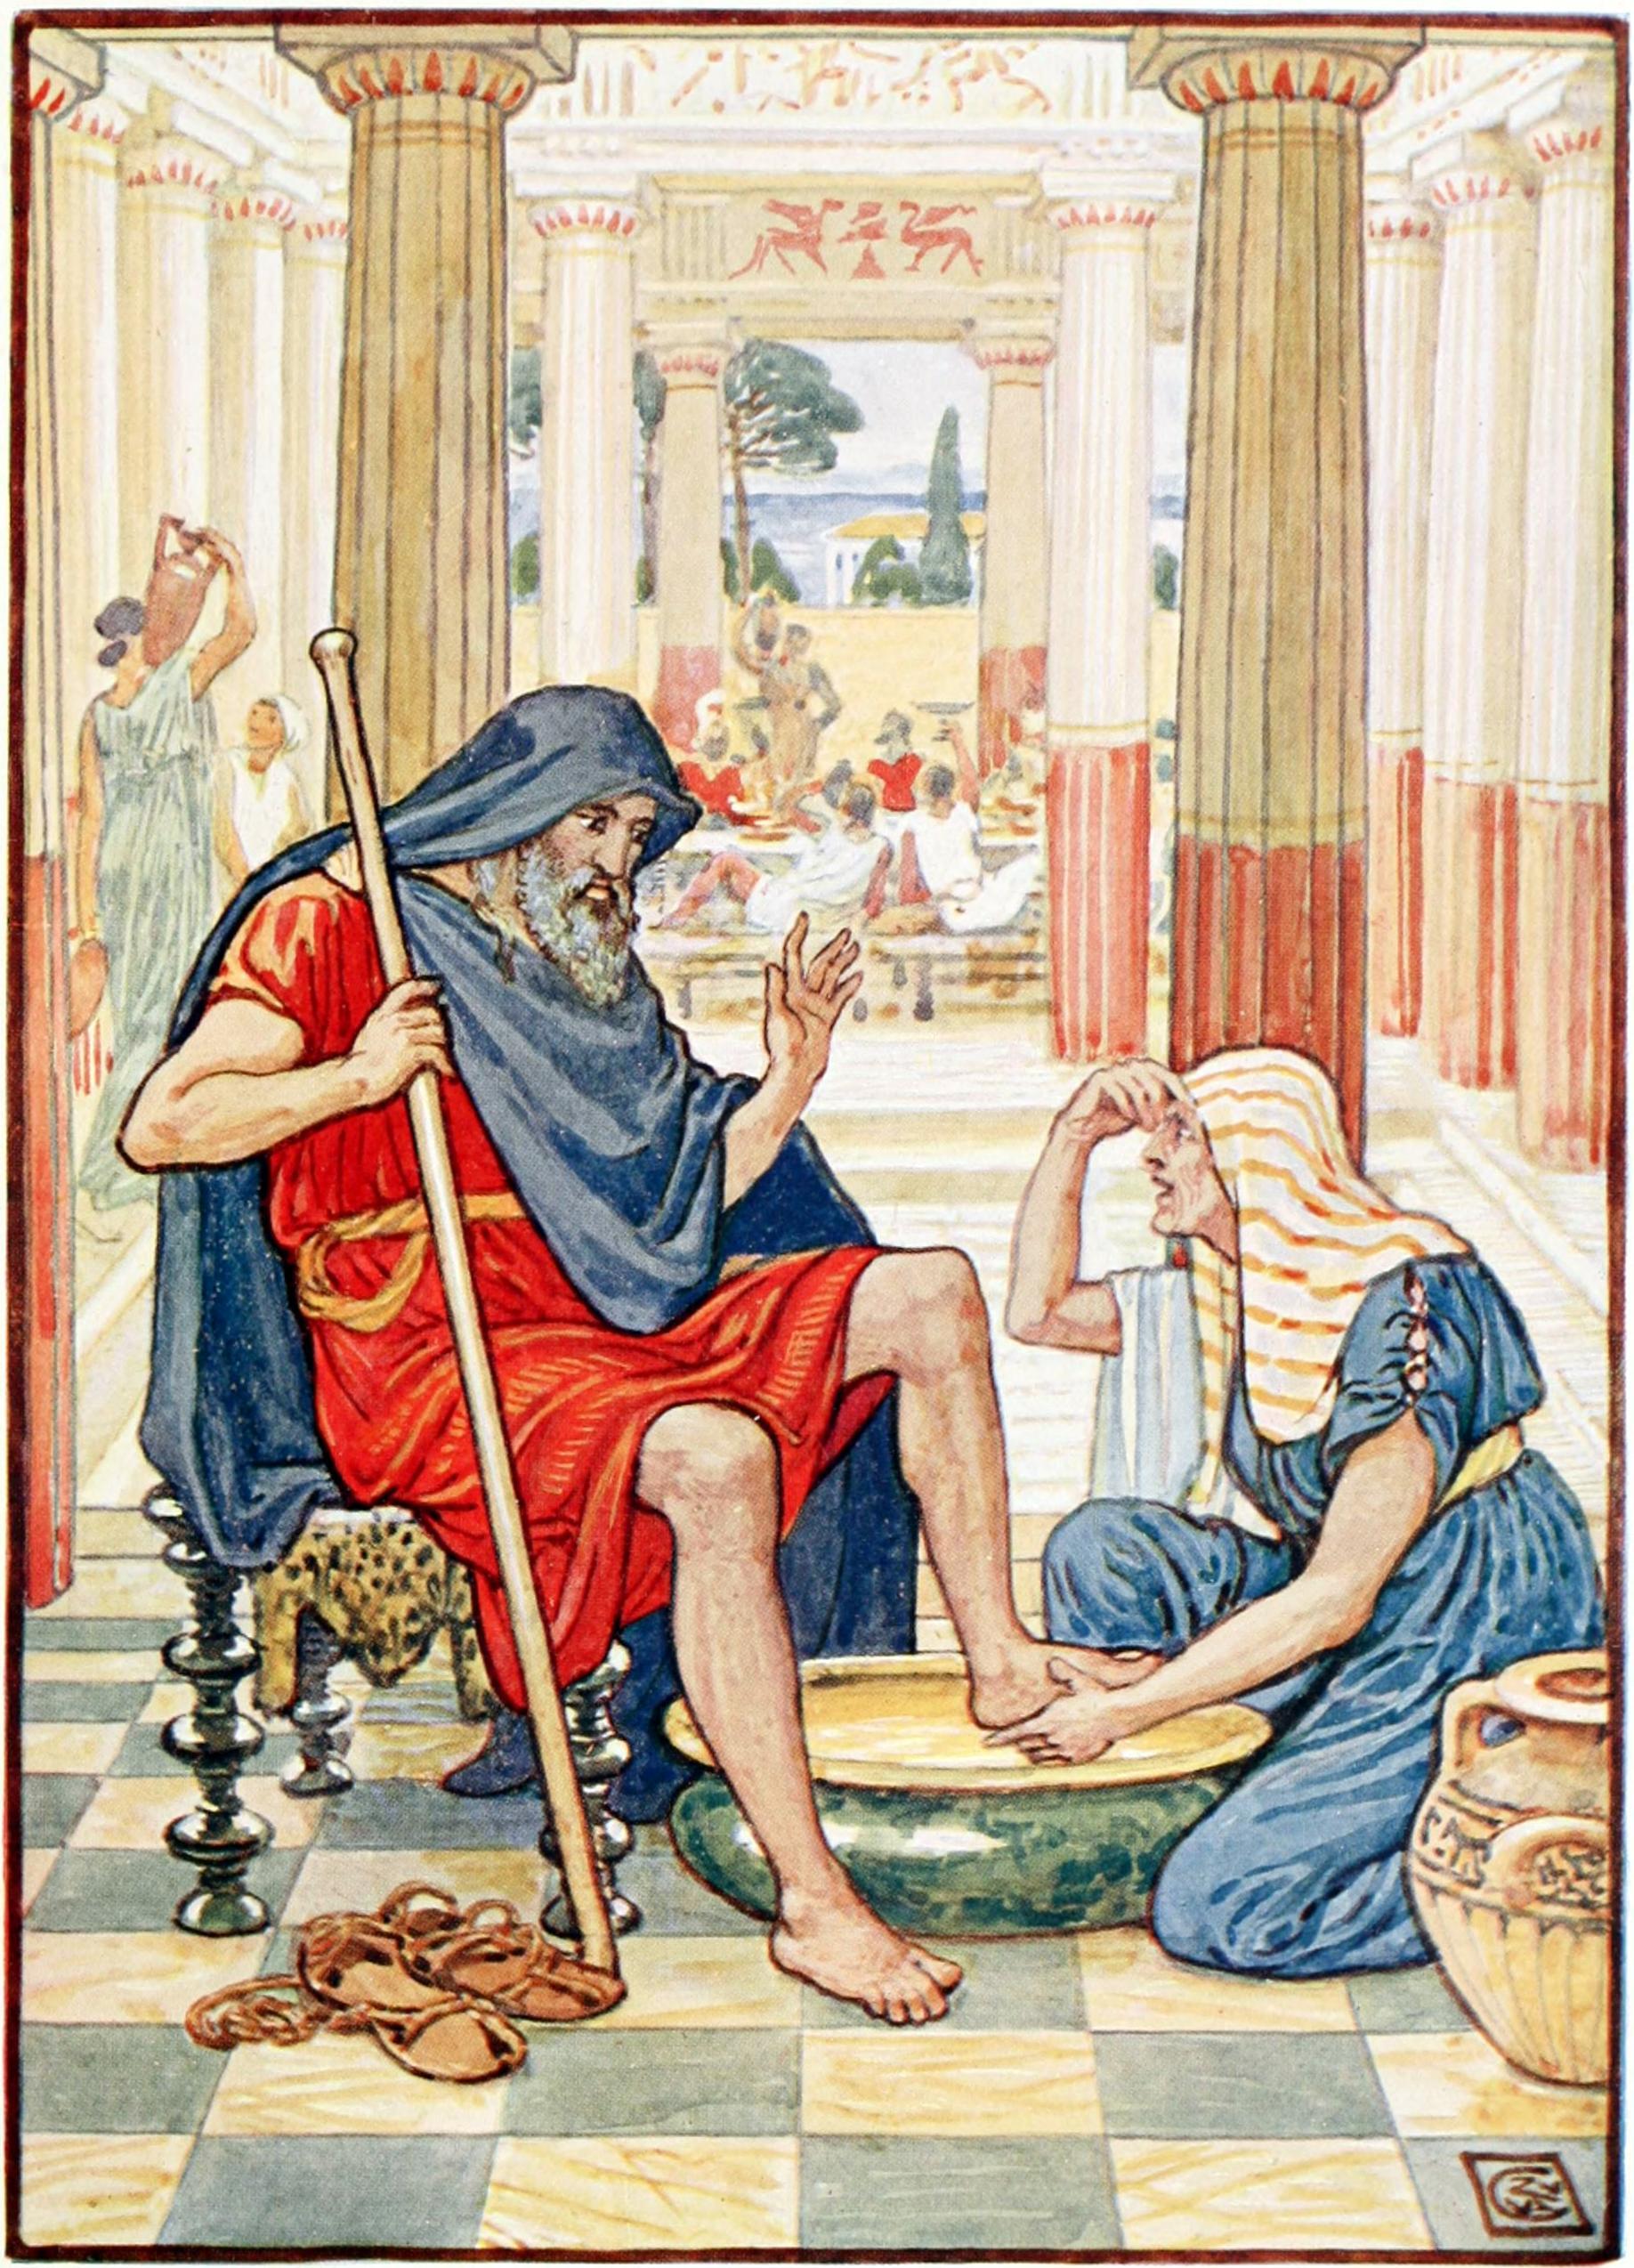 Fichier:Yea, Verily, thou art odysseus.jpg — Wikipédia